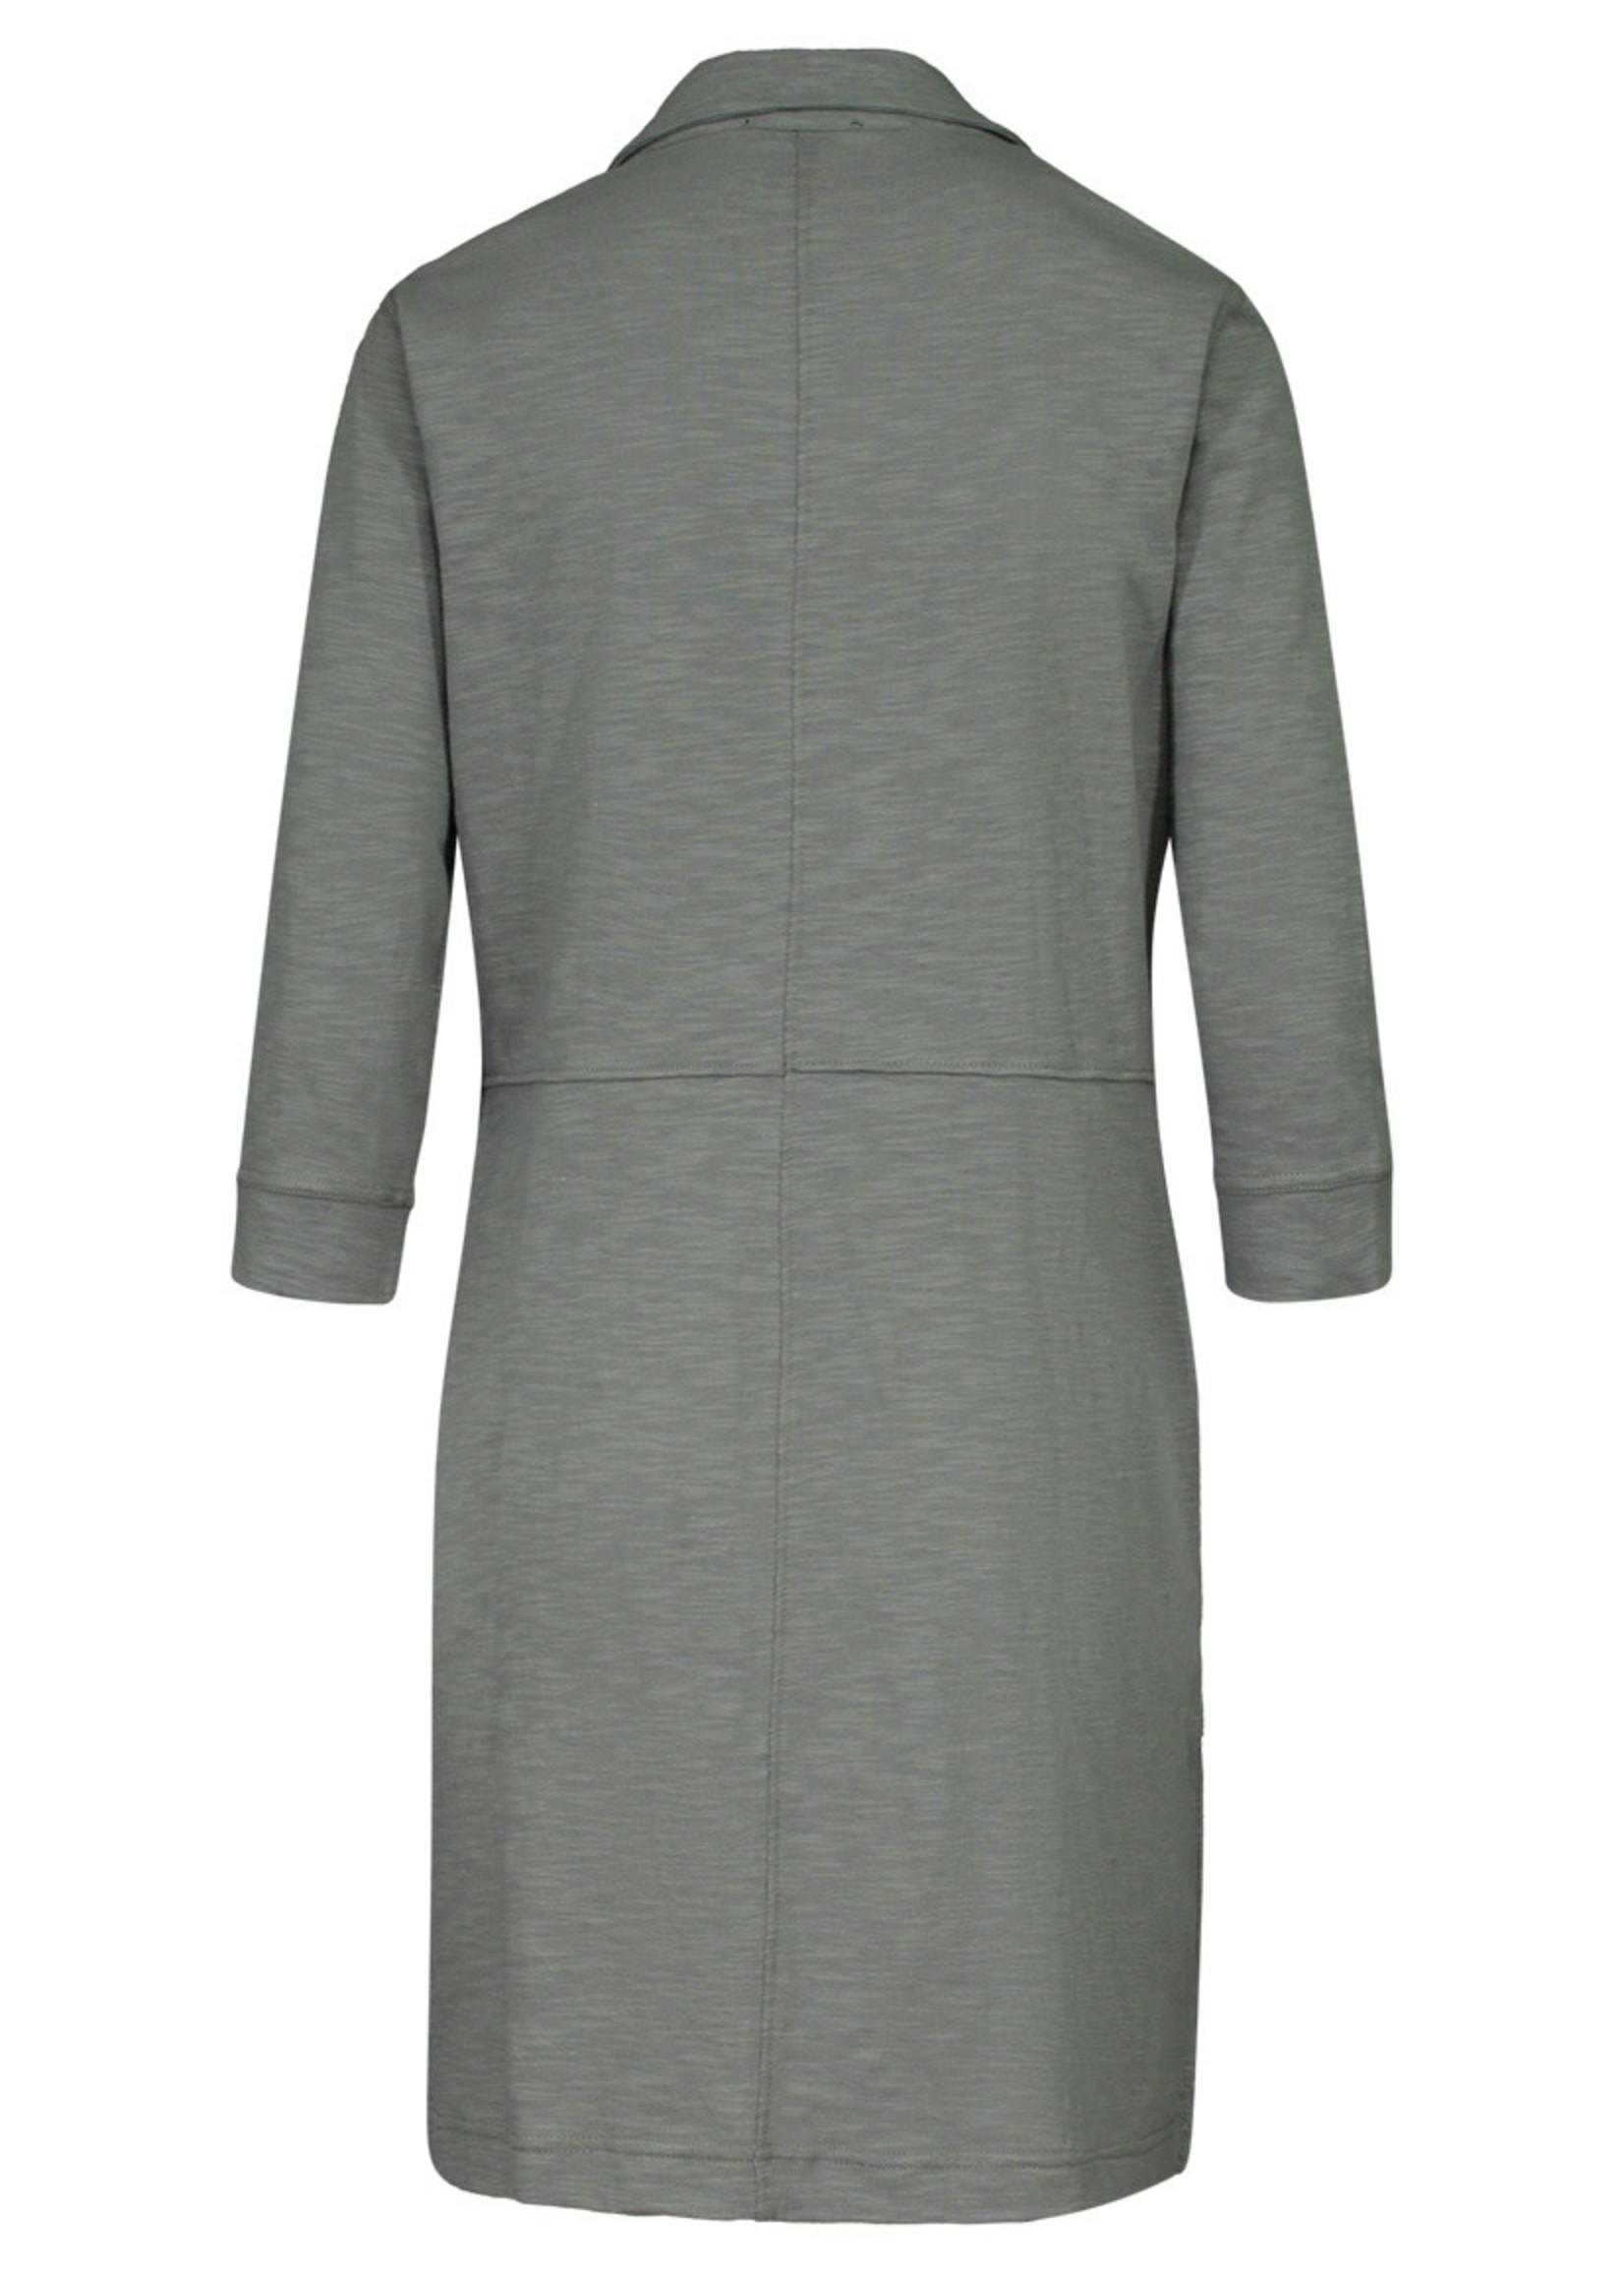 Tribal Tribal 3/4 Sleeve Cargo Dress